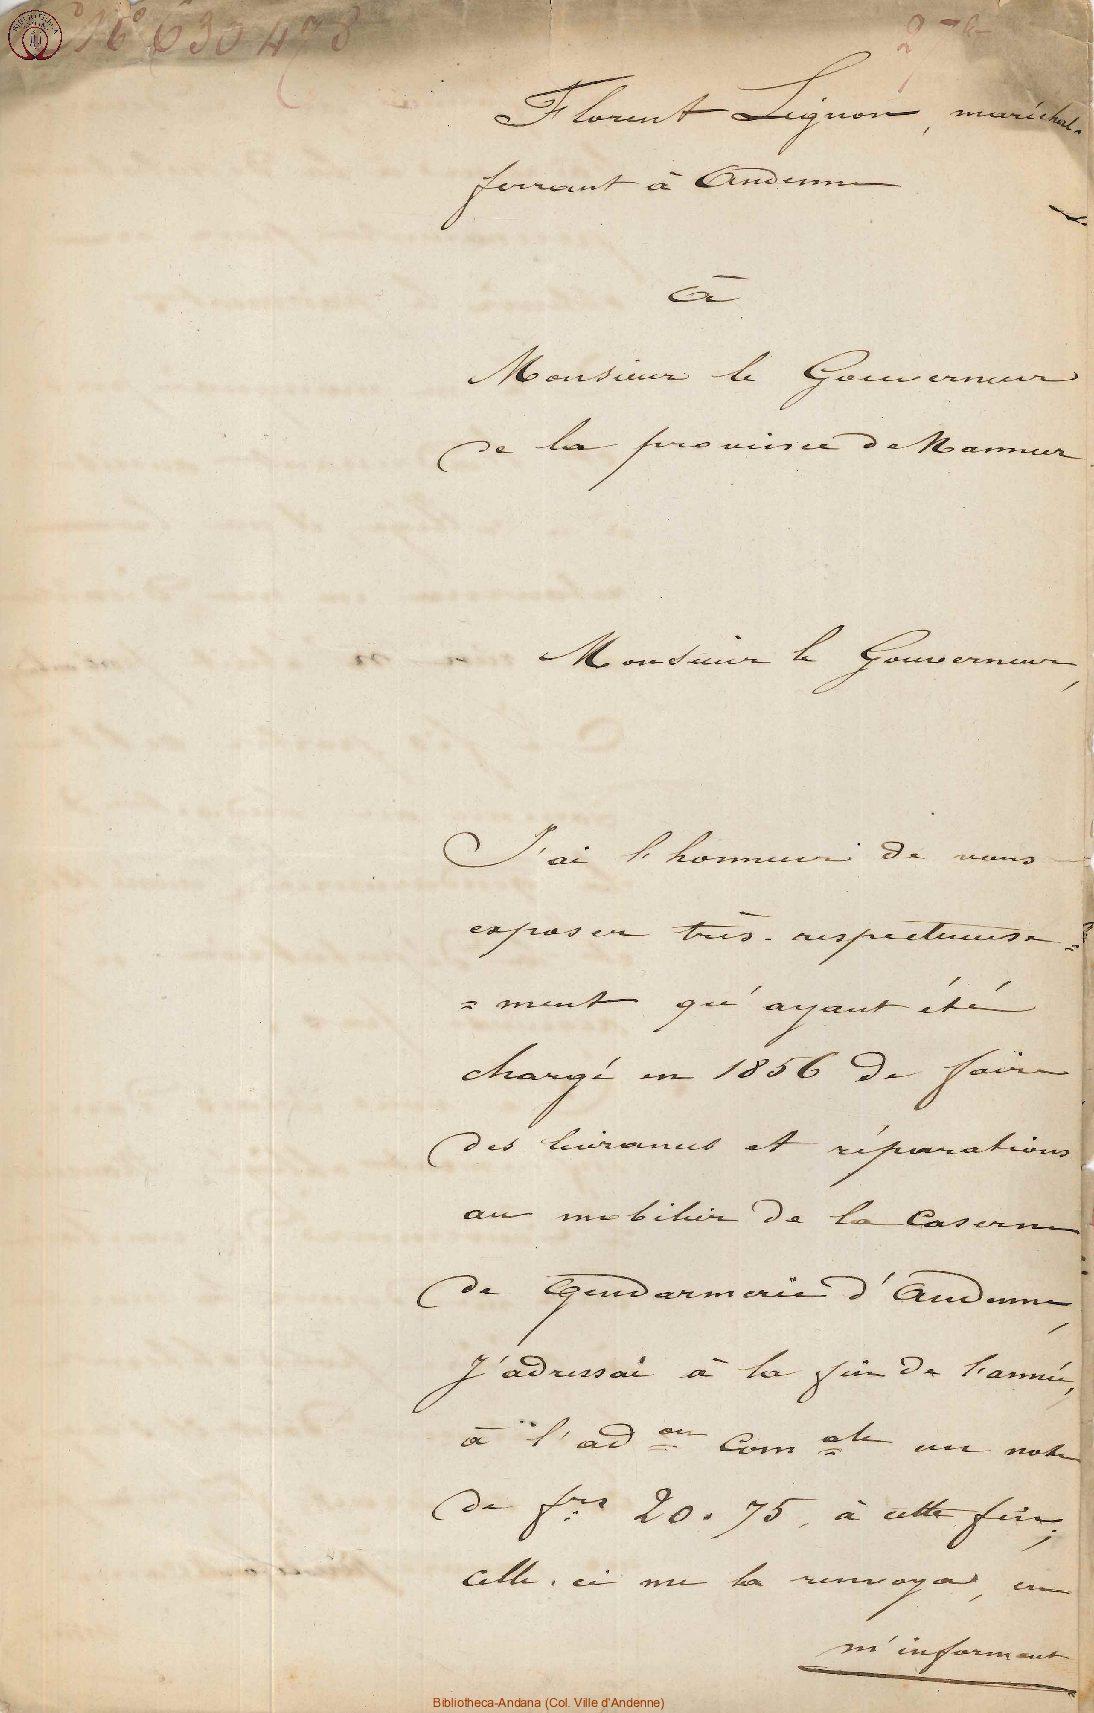 1859-08-29